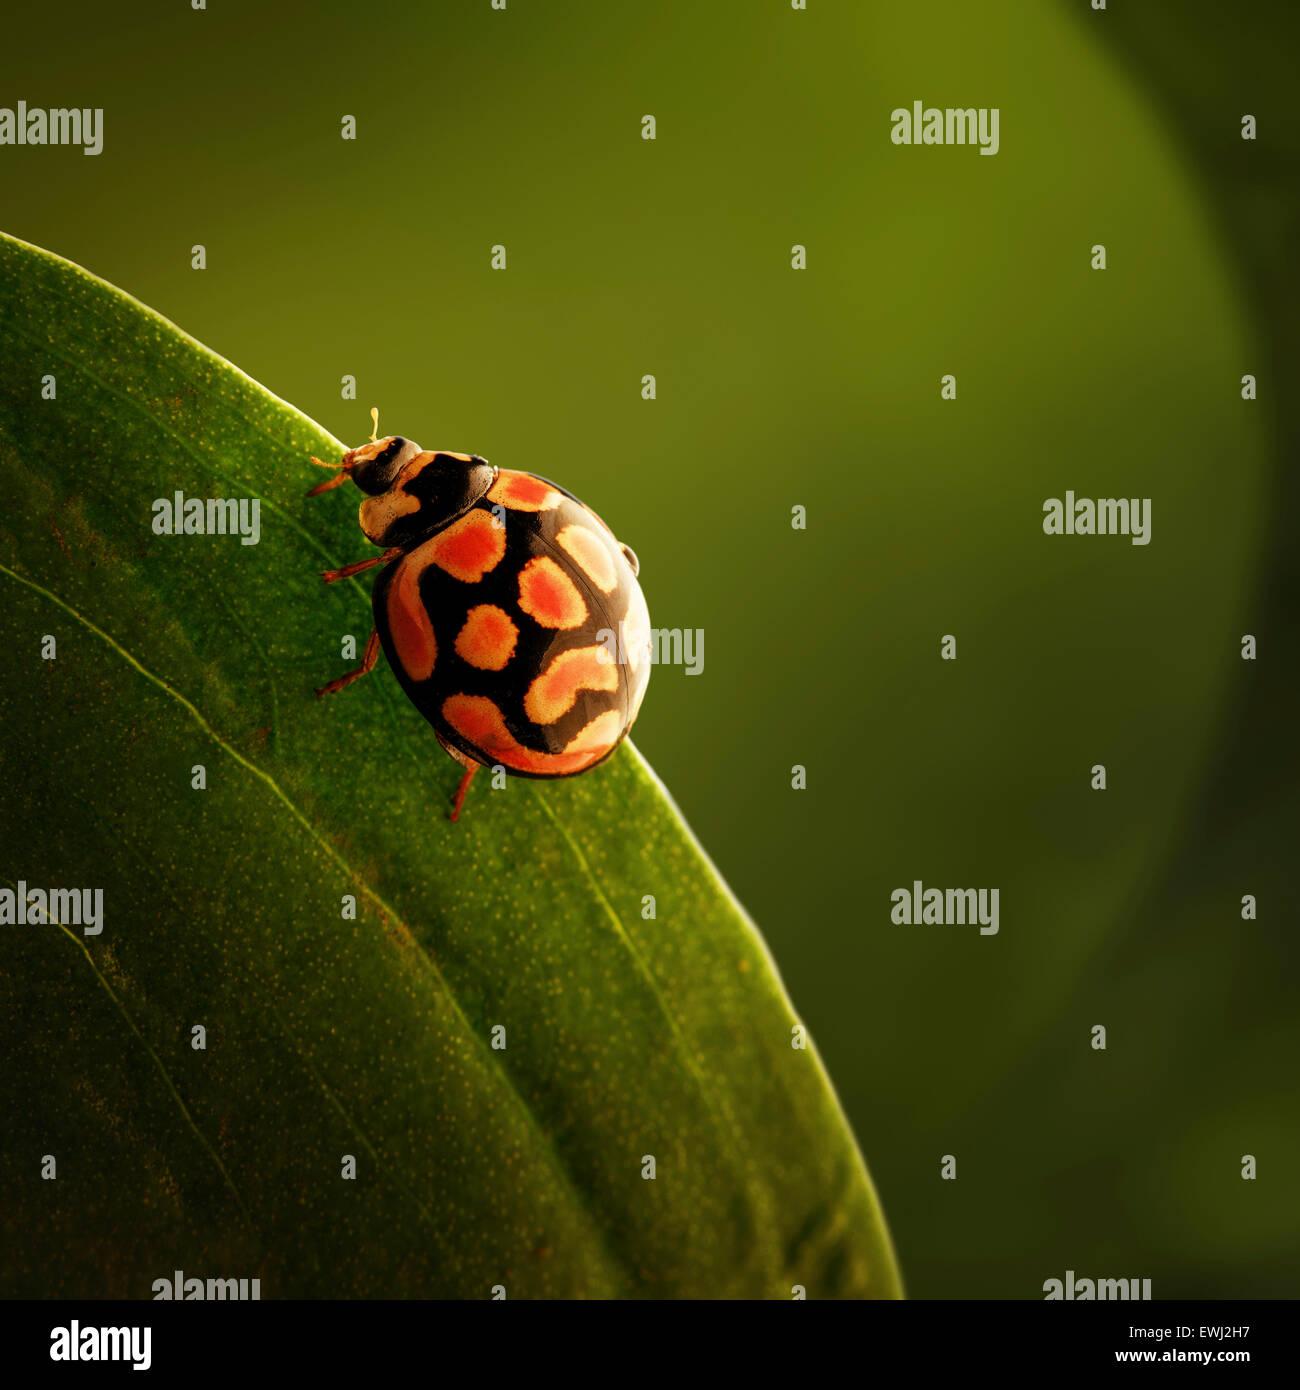 Ladybug (ladybird) crawling on the edge of a green leaf (South Africa - Mpumalanga) - Stock Image